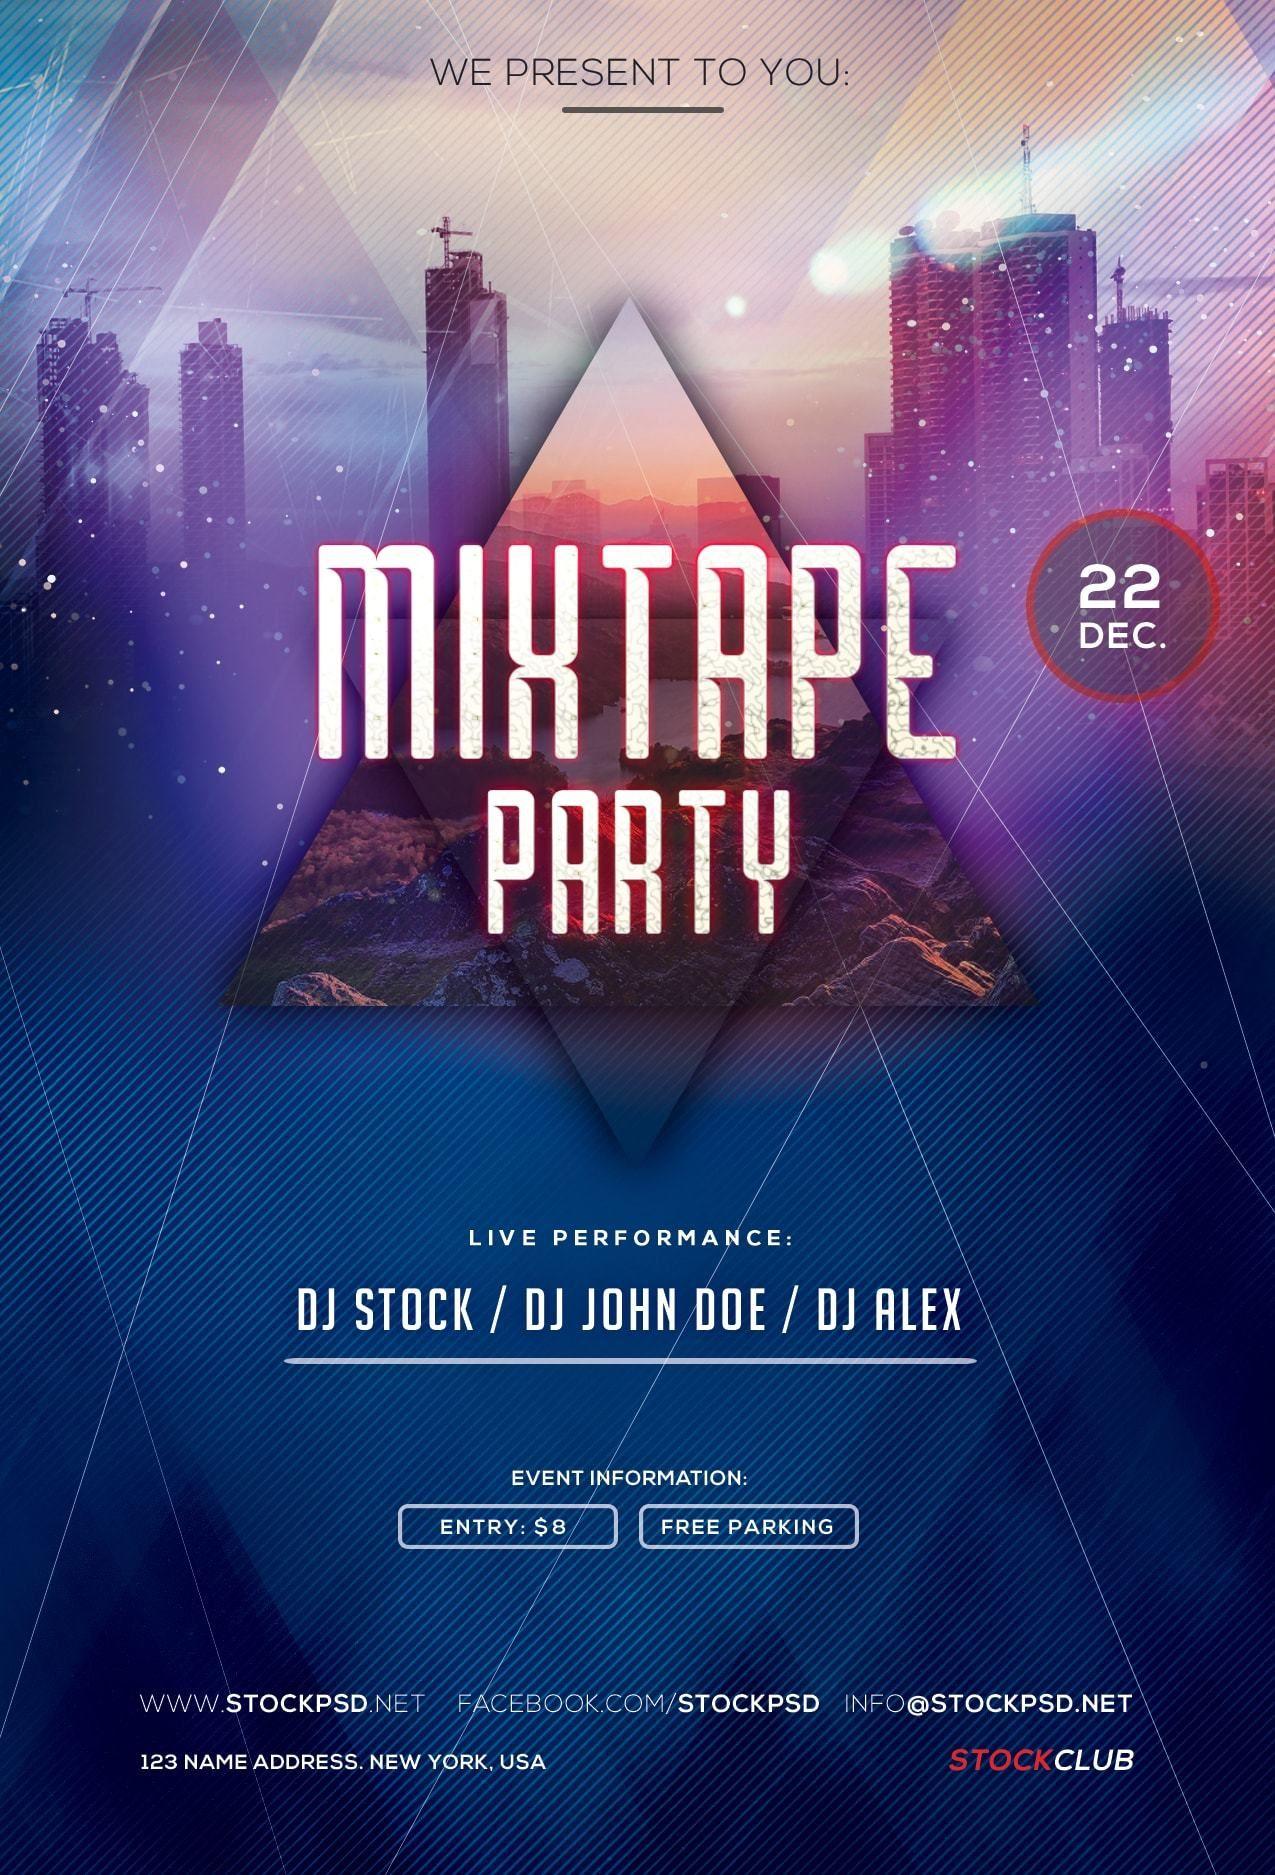 Pixelsdesign Mixtape Party Freebie Psd Flyer Template